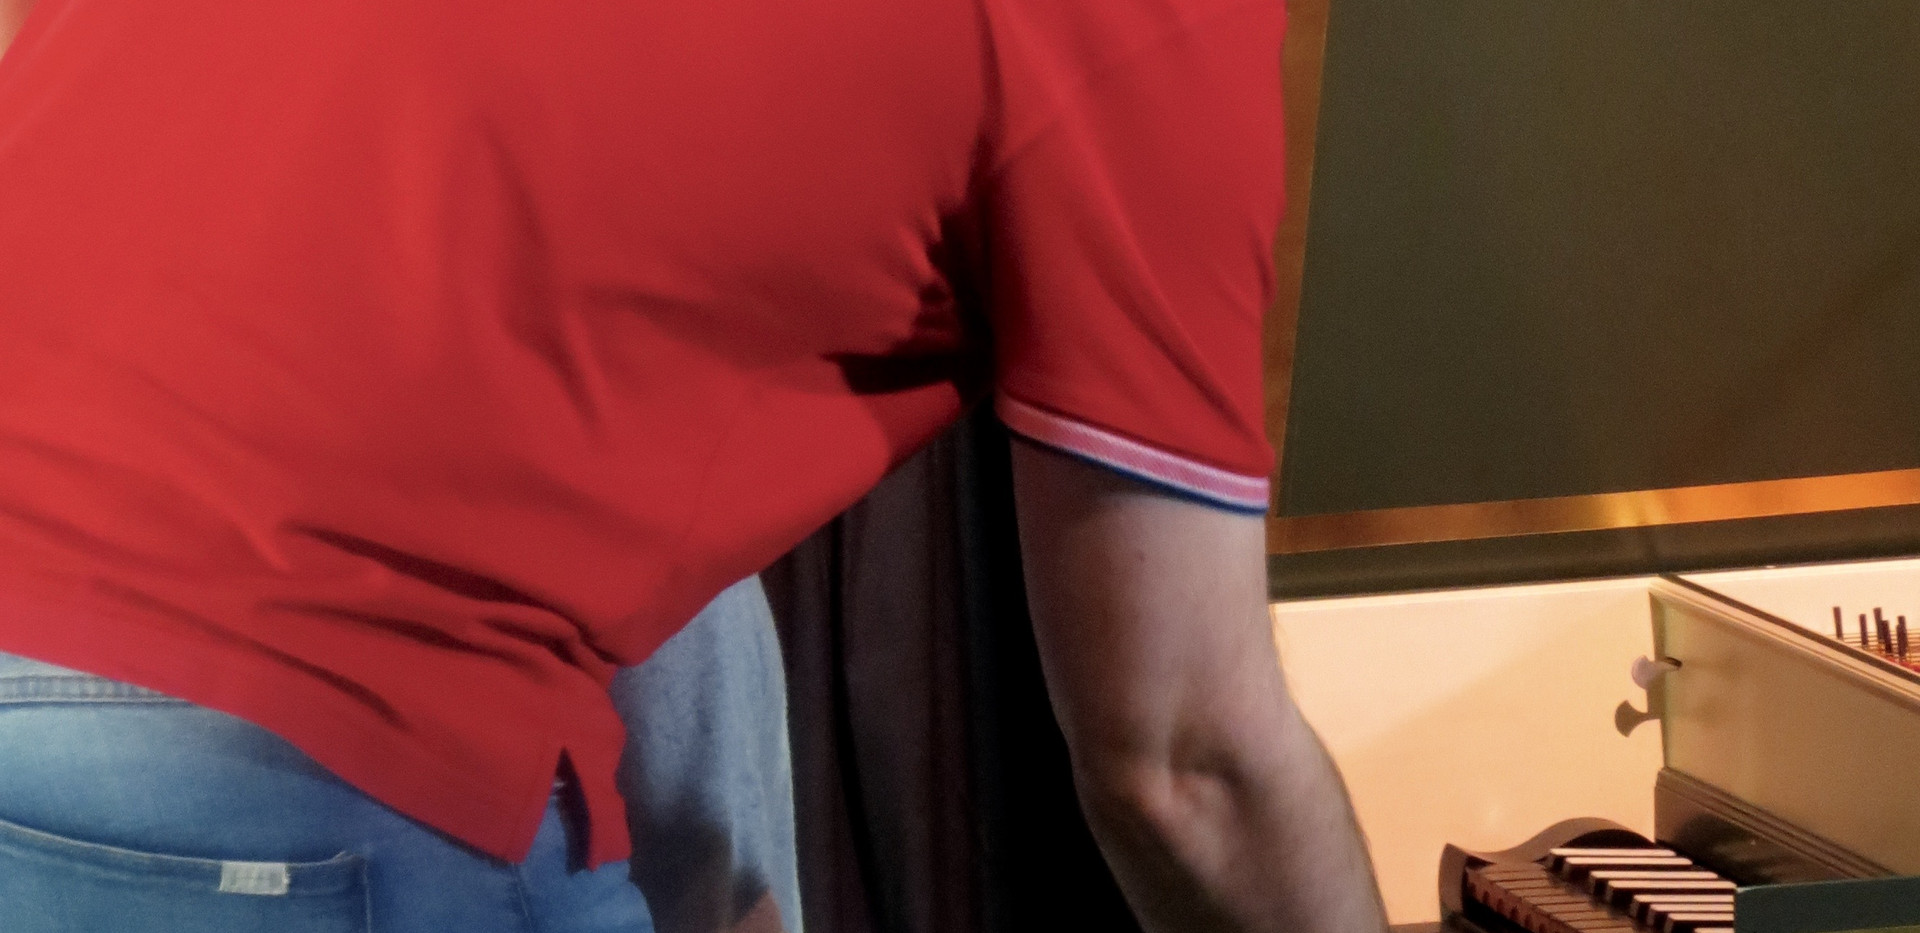 Mario Correcting Hand Position.jpg